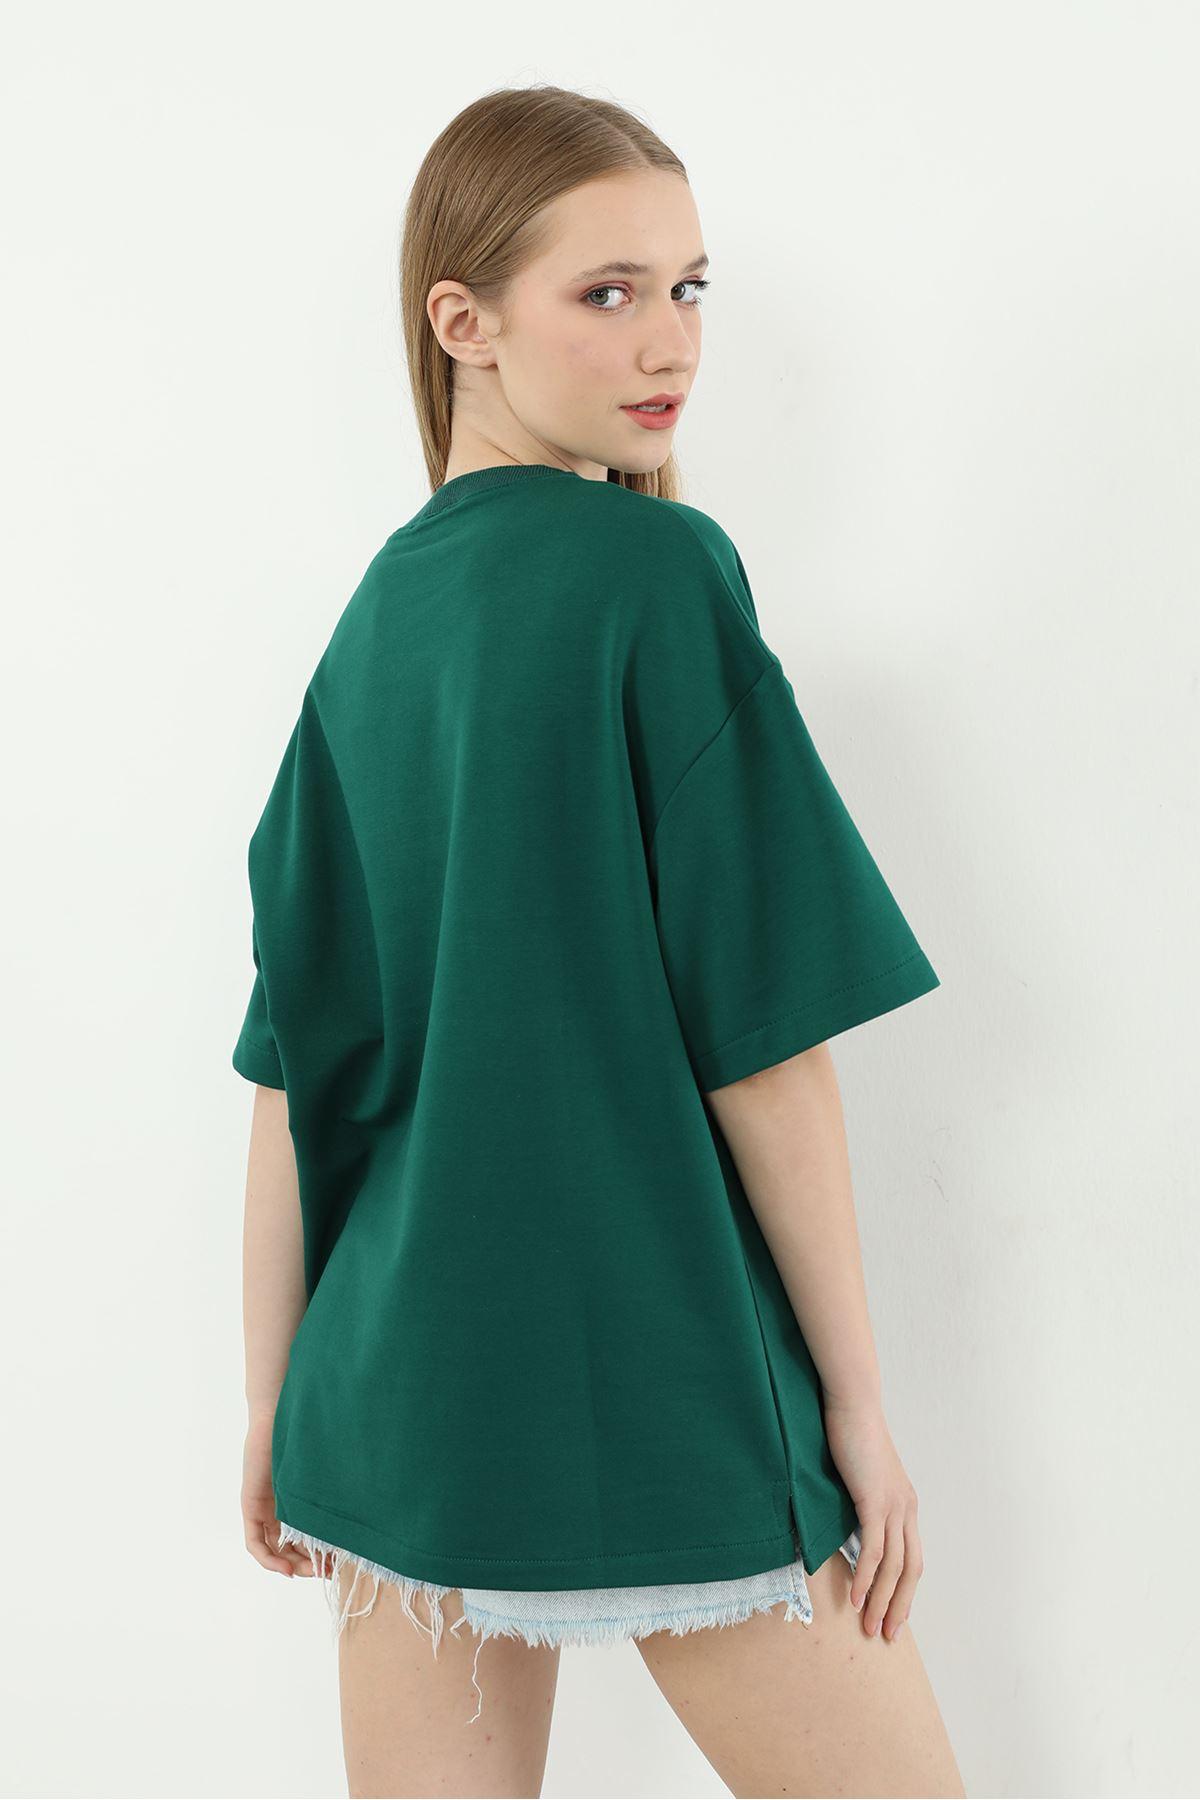 Basıc Kadın T-shirt-Yeşil